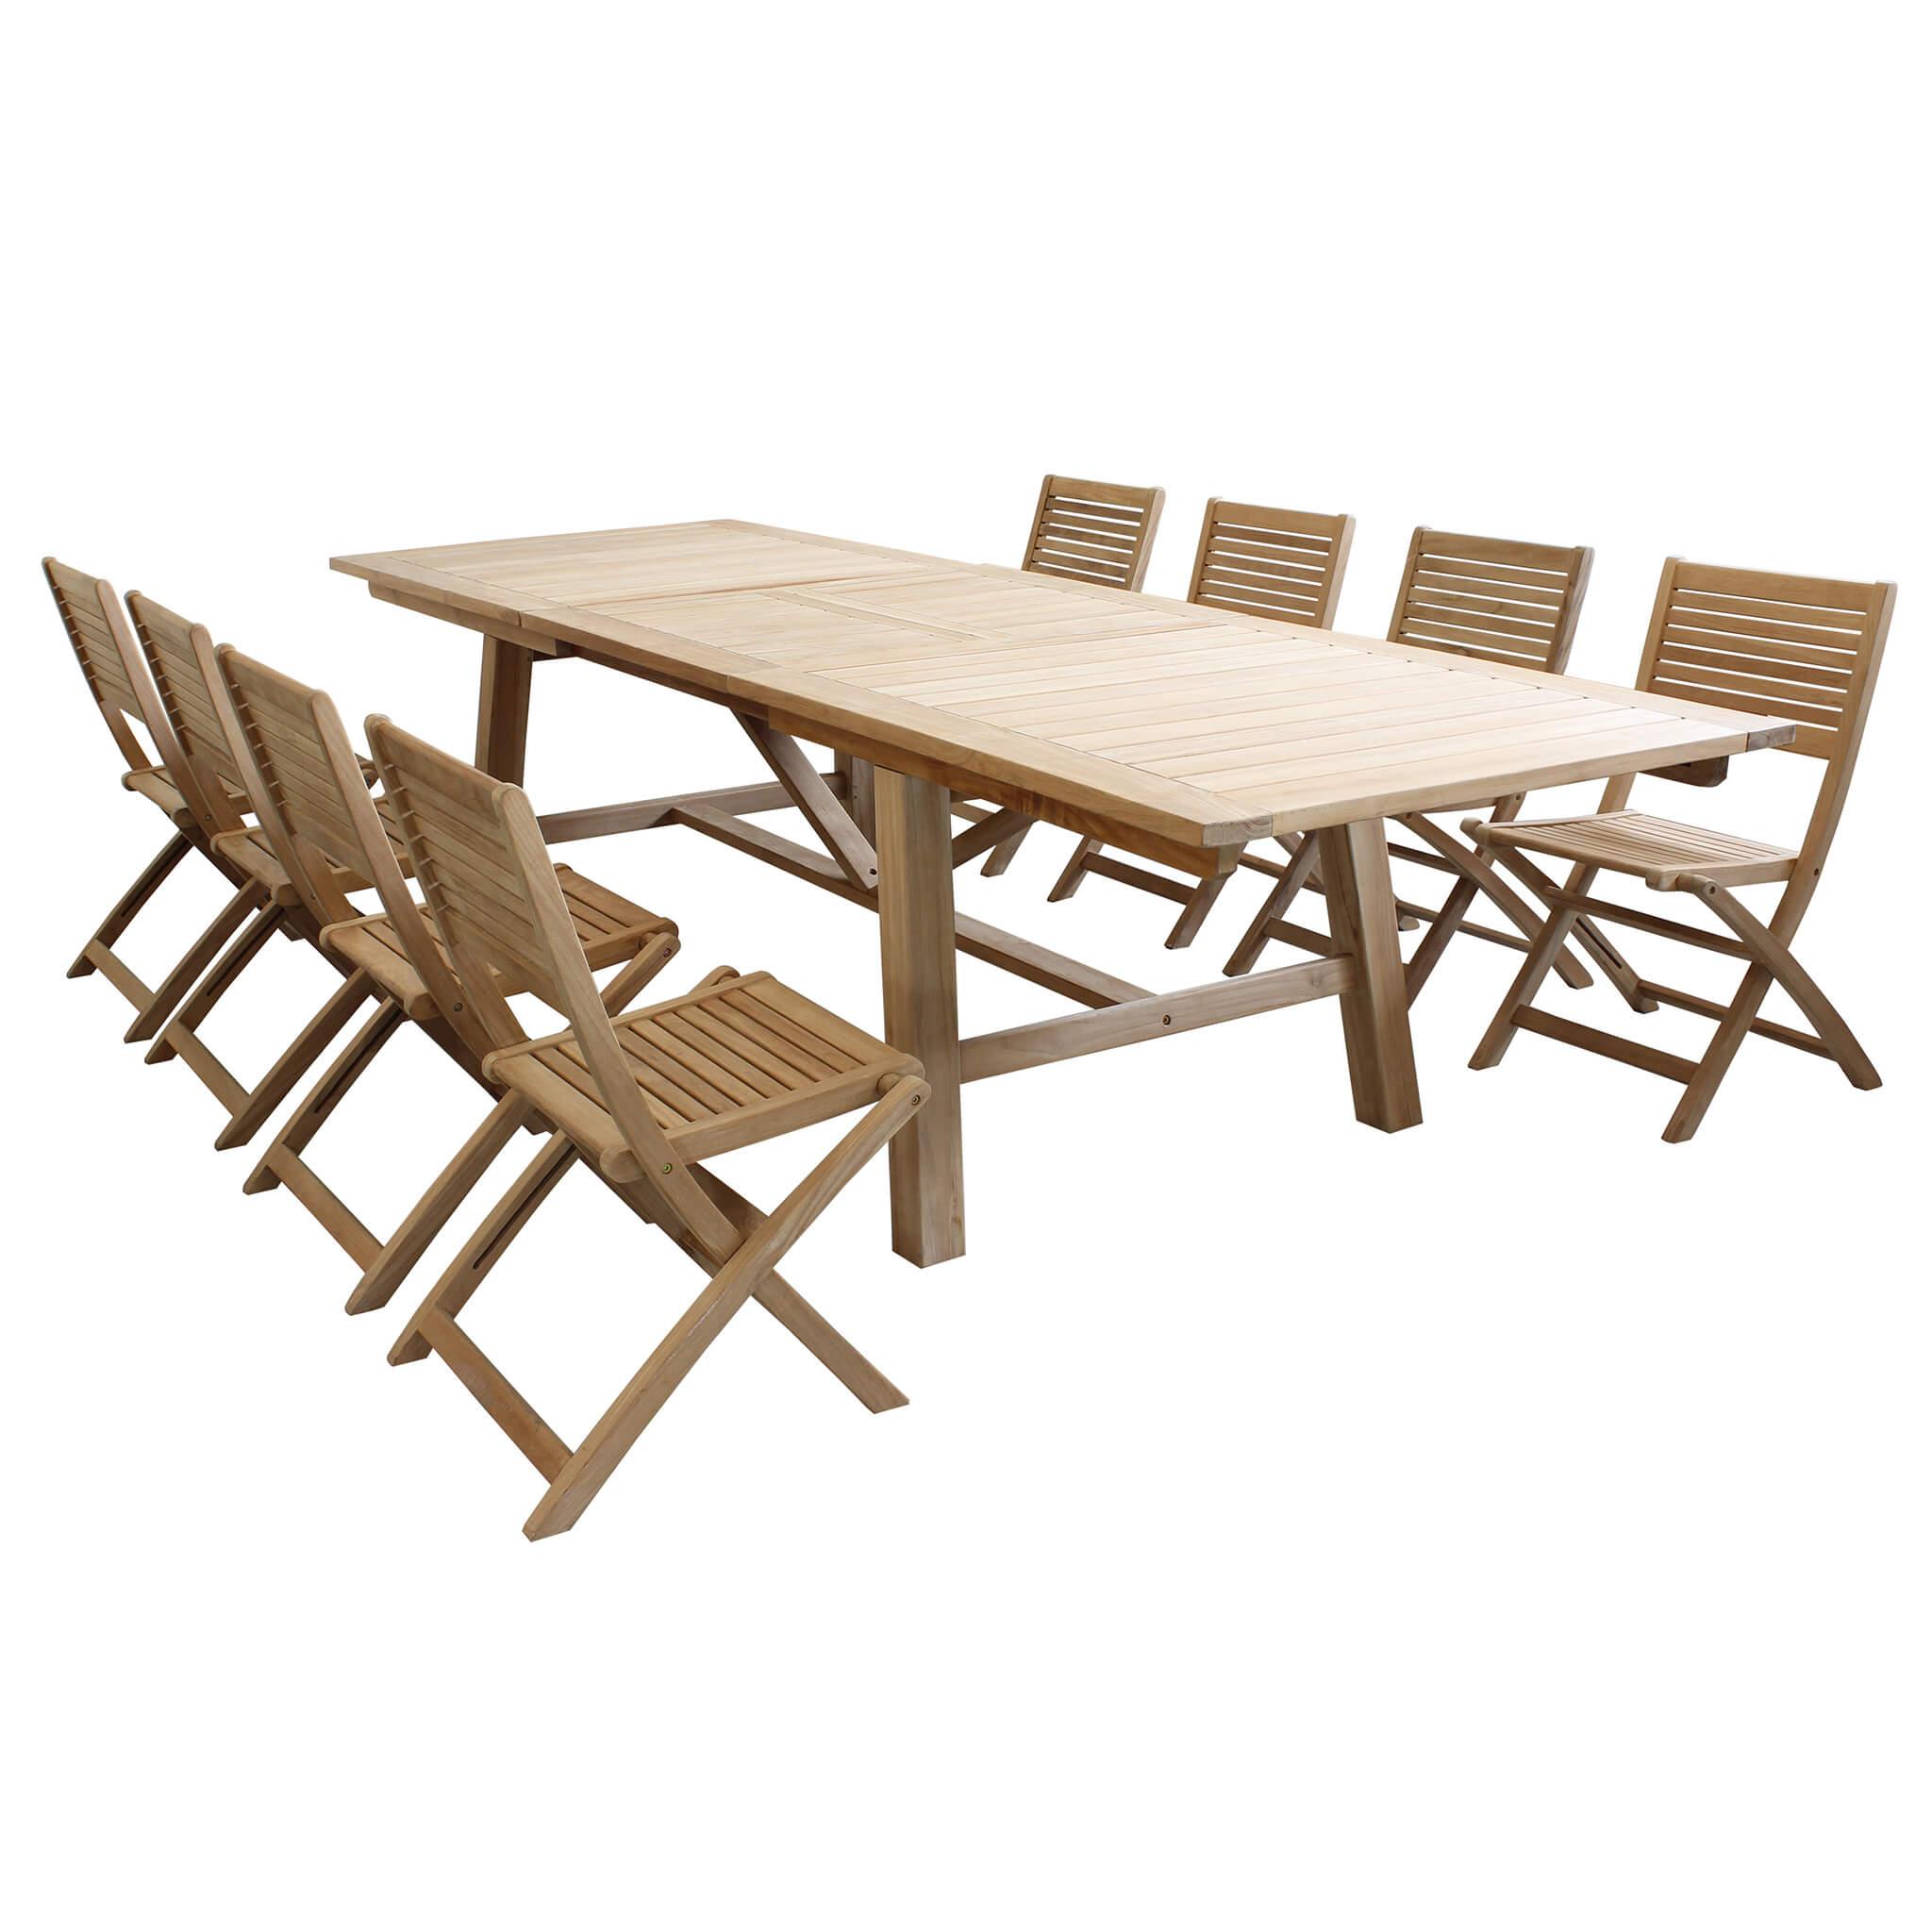 Milani Home ORATOR - set tavolo in teak cm 160/240 x 90 x 77 h con 8 sedute